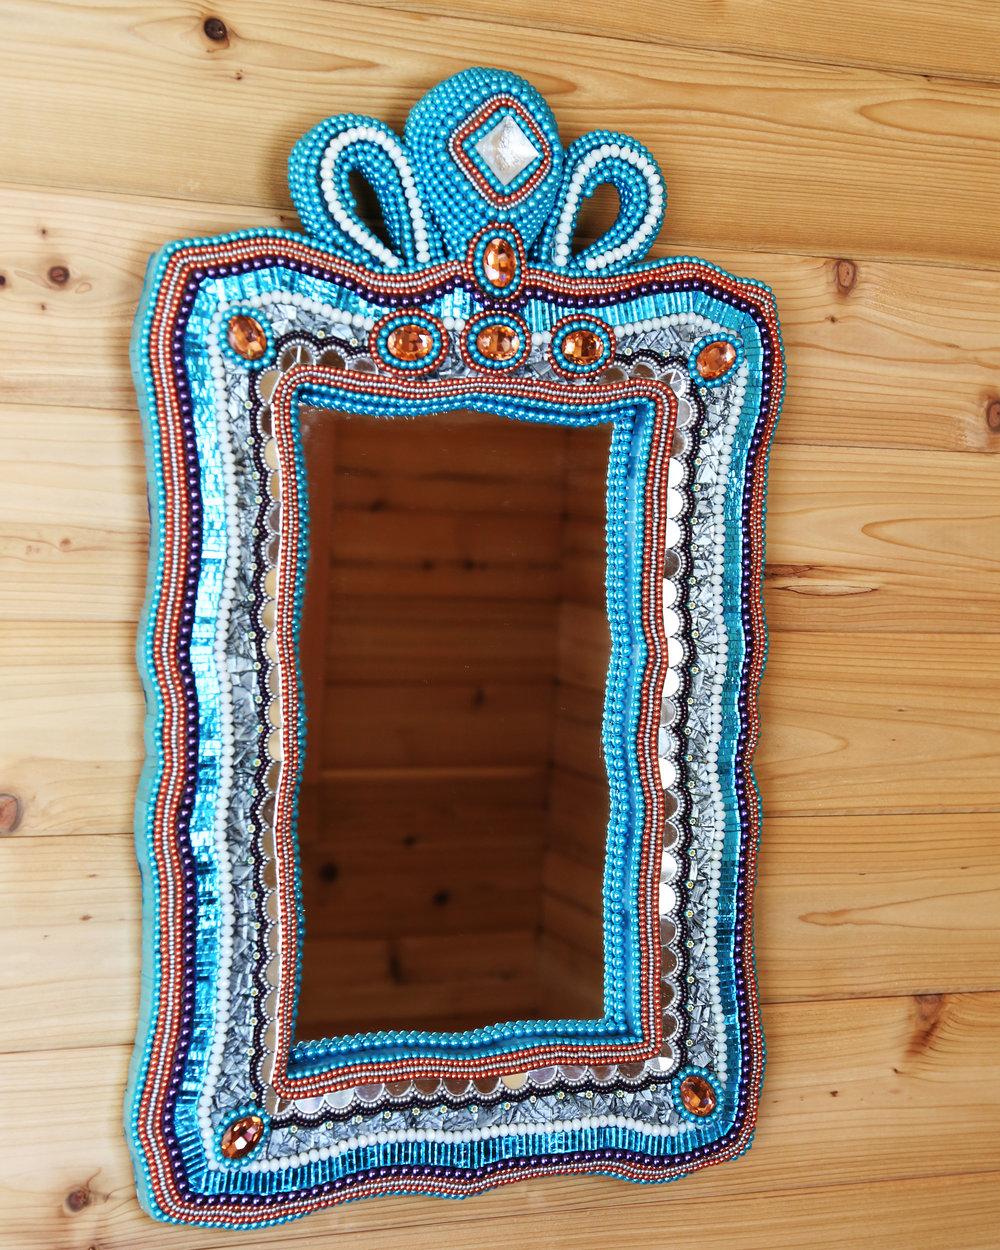 aqua mirror.JPG